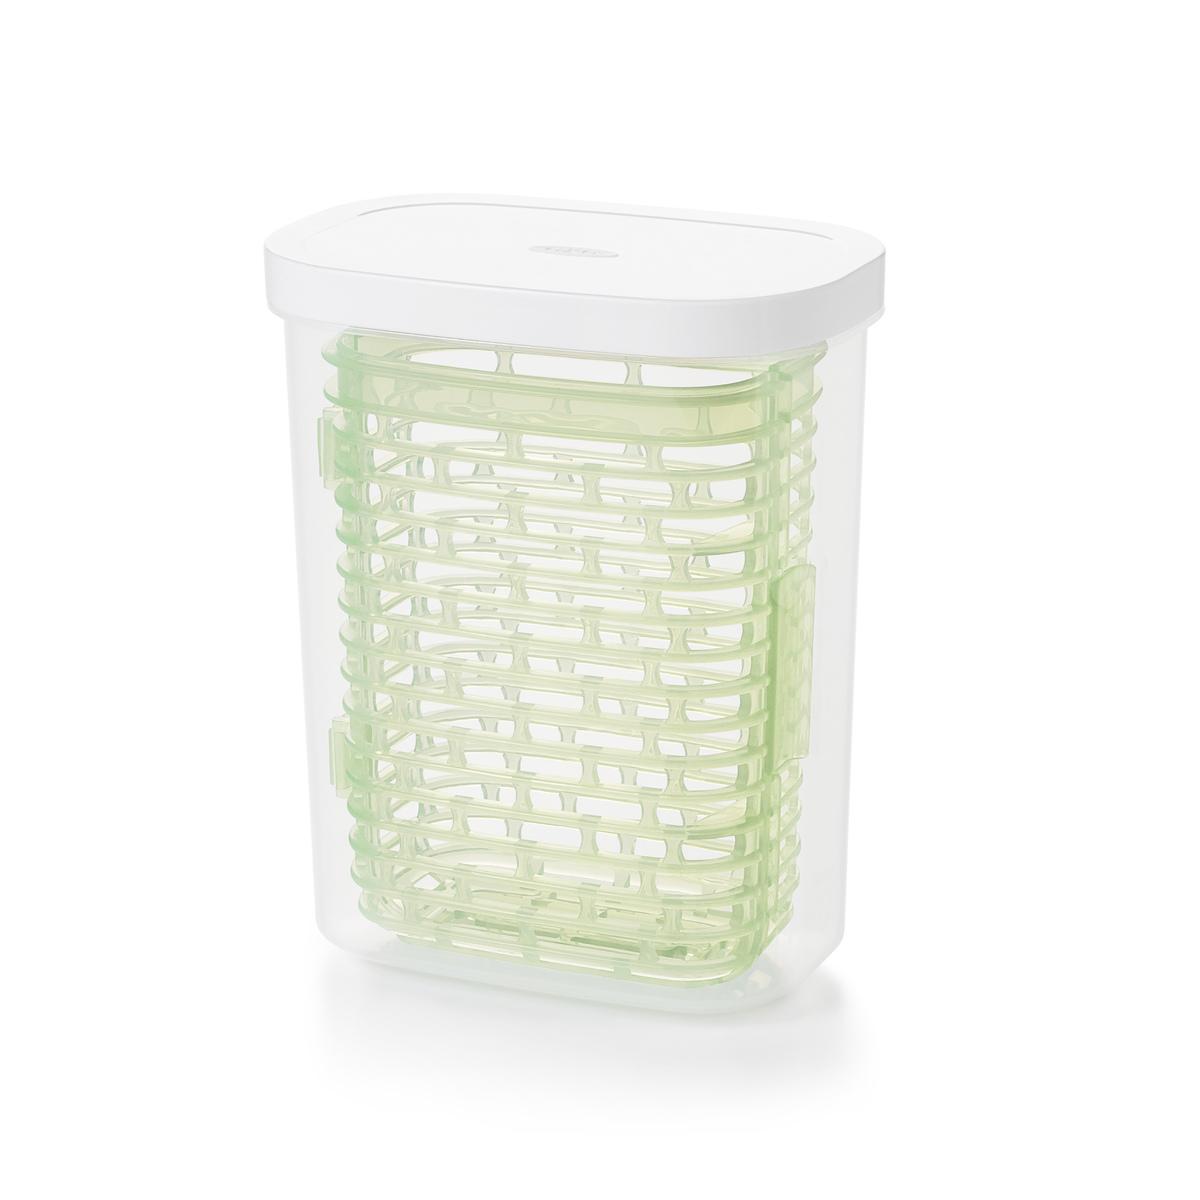 Онлайн каталог PROMENU: Контейнер маленький для хранения зелени OXO FOOD STORAGE, прозрачный                               11212200